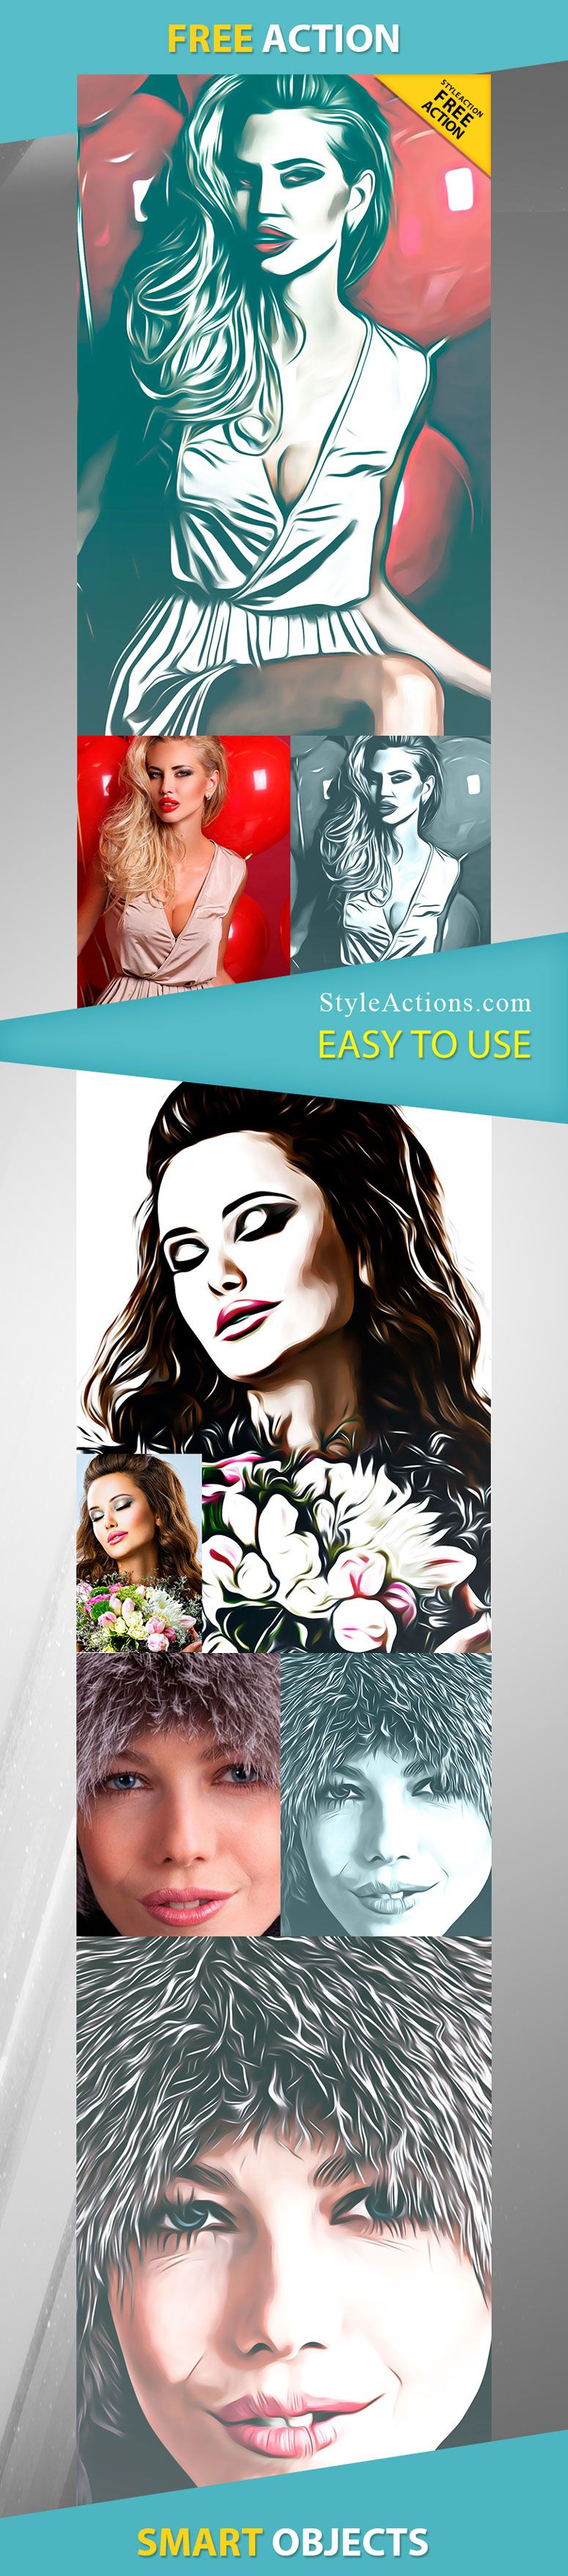 Art Action Free Download 15865 Free